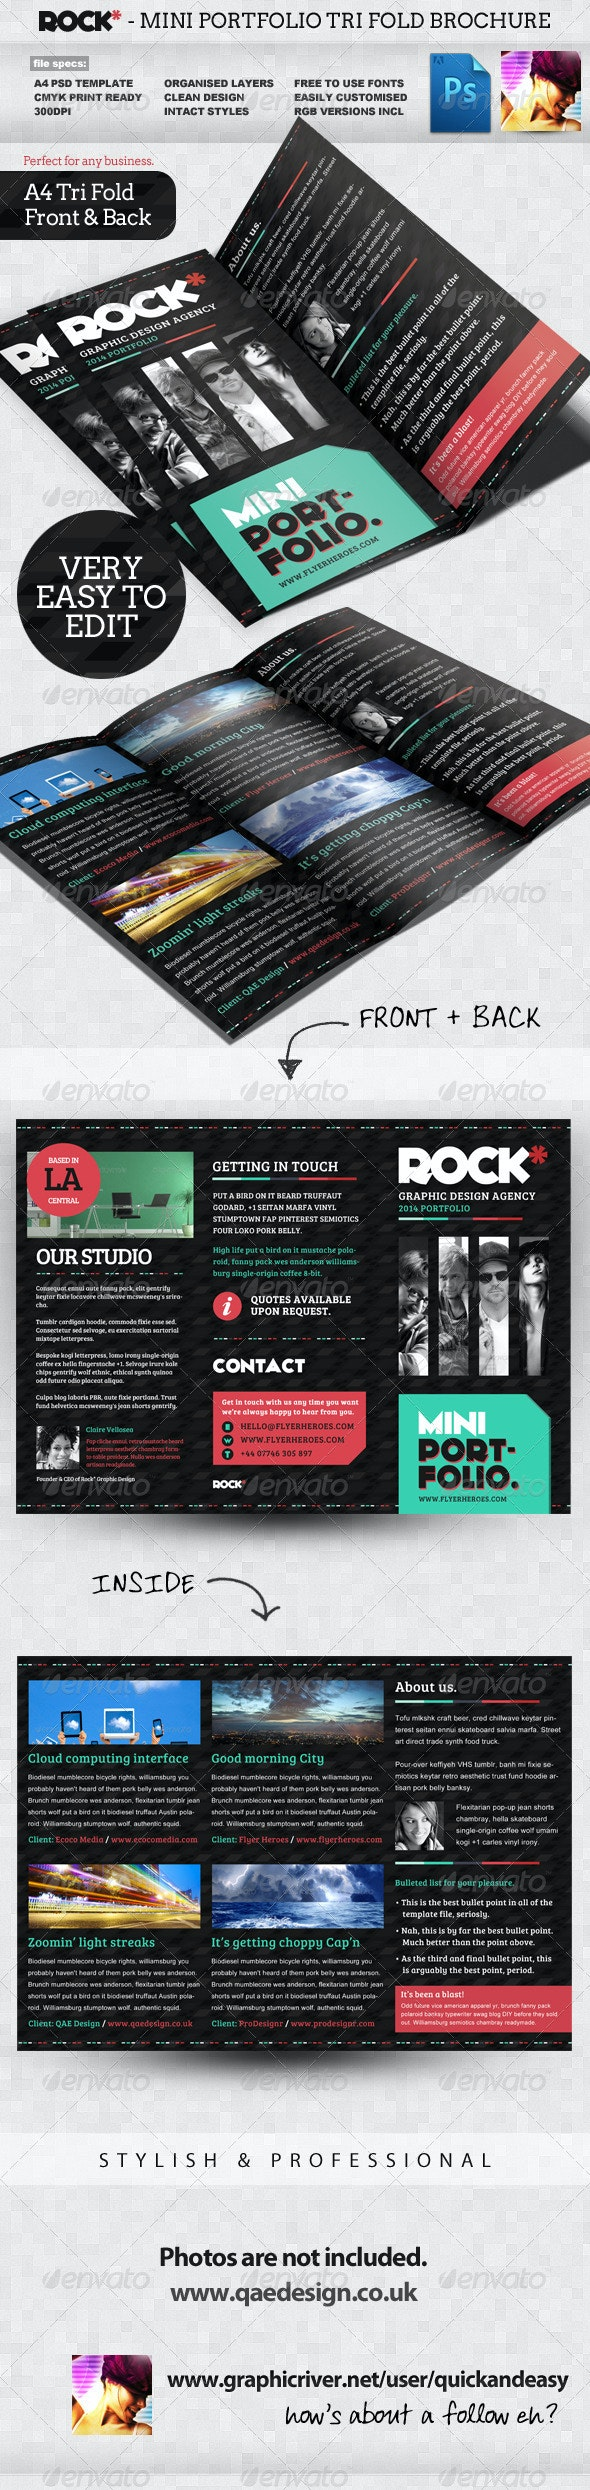 Rock* Tri-fold Portfolio Template - Portfolio Brochures